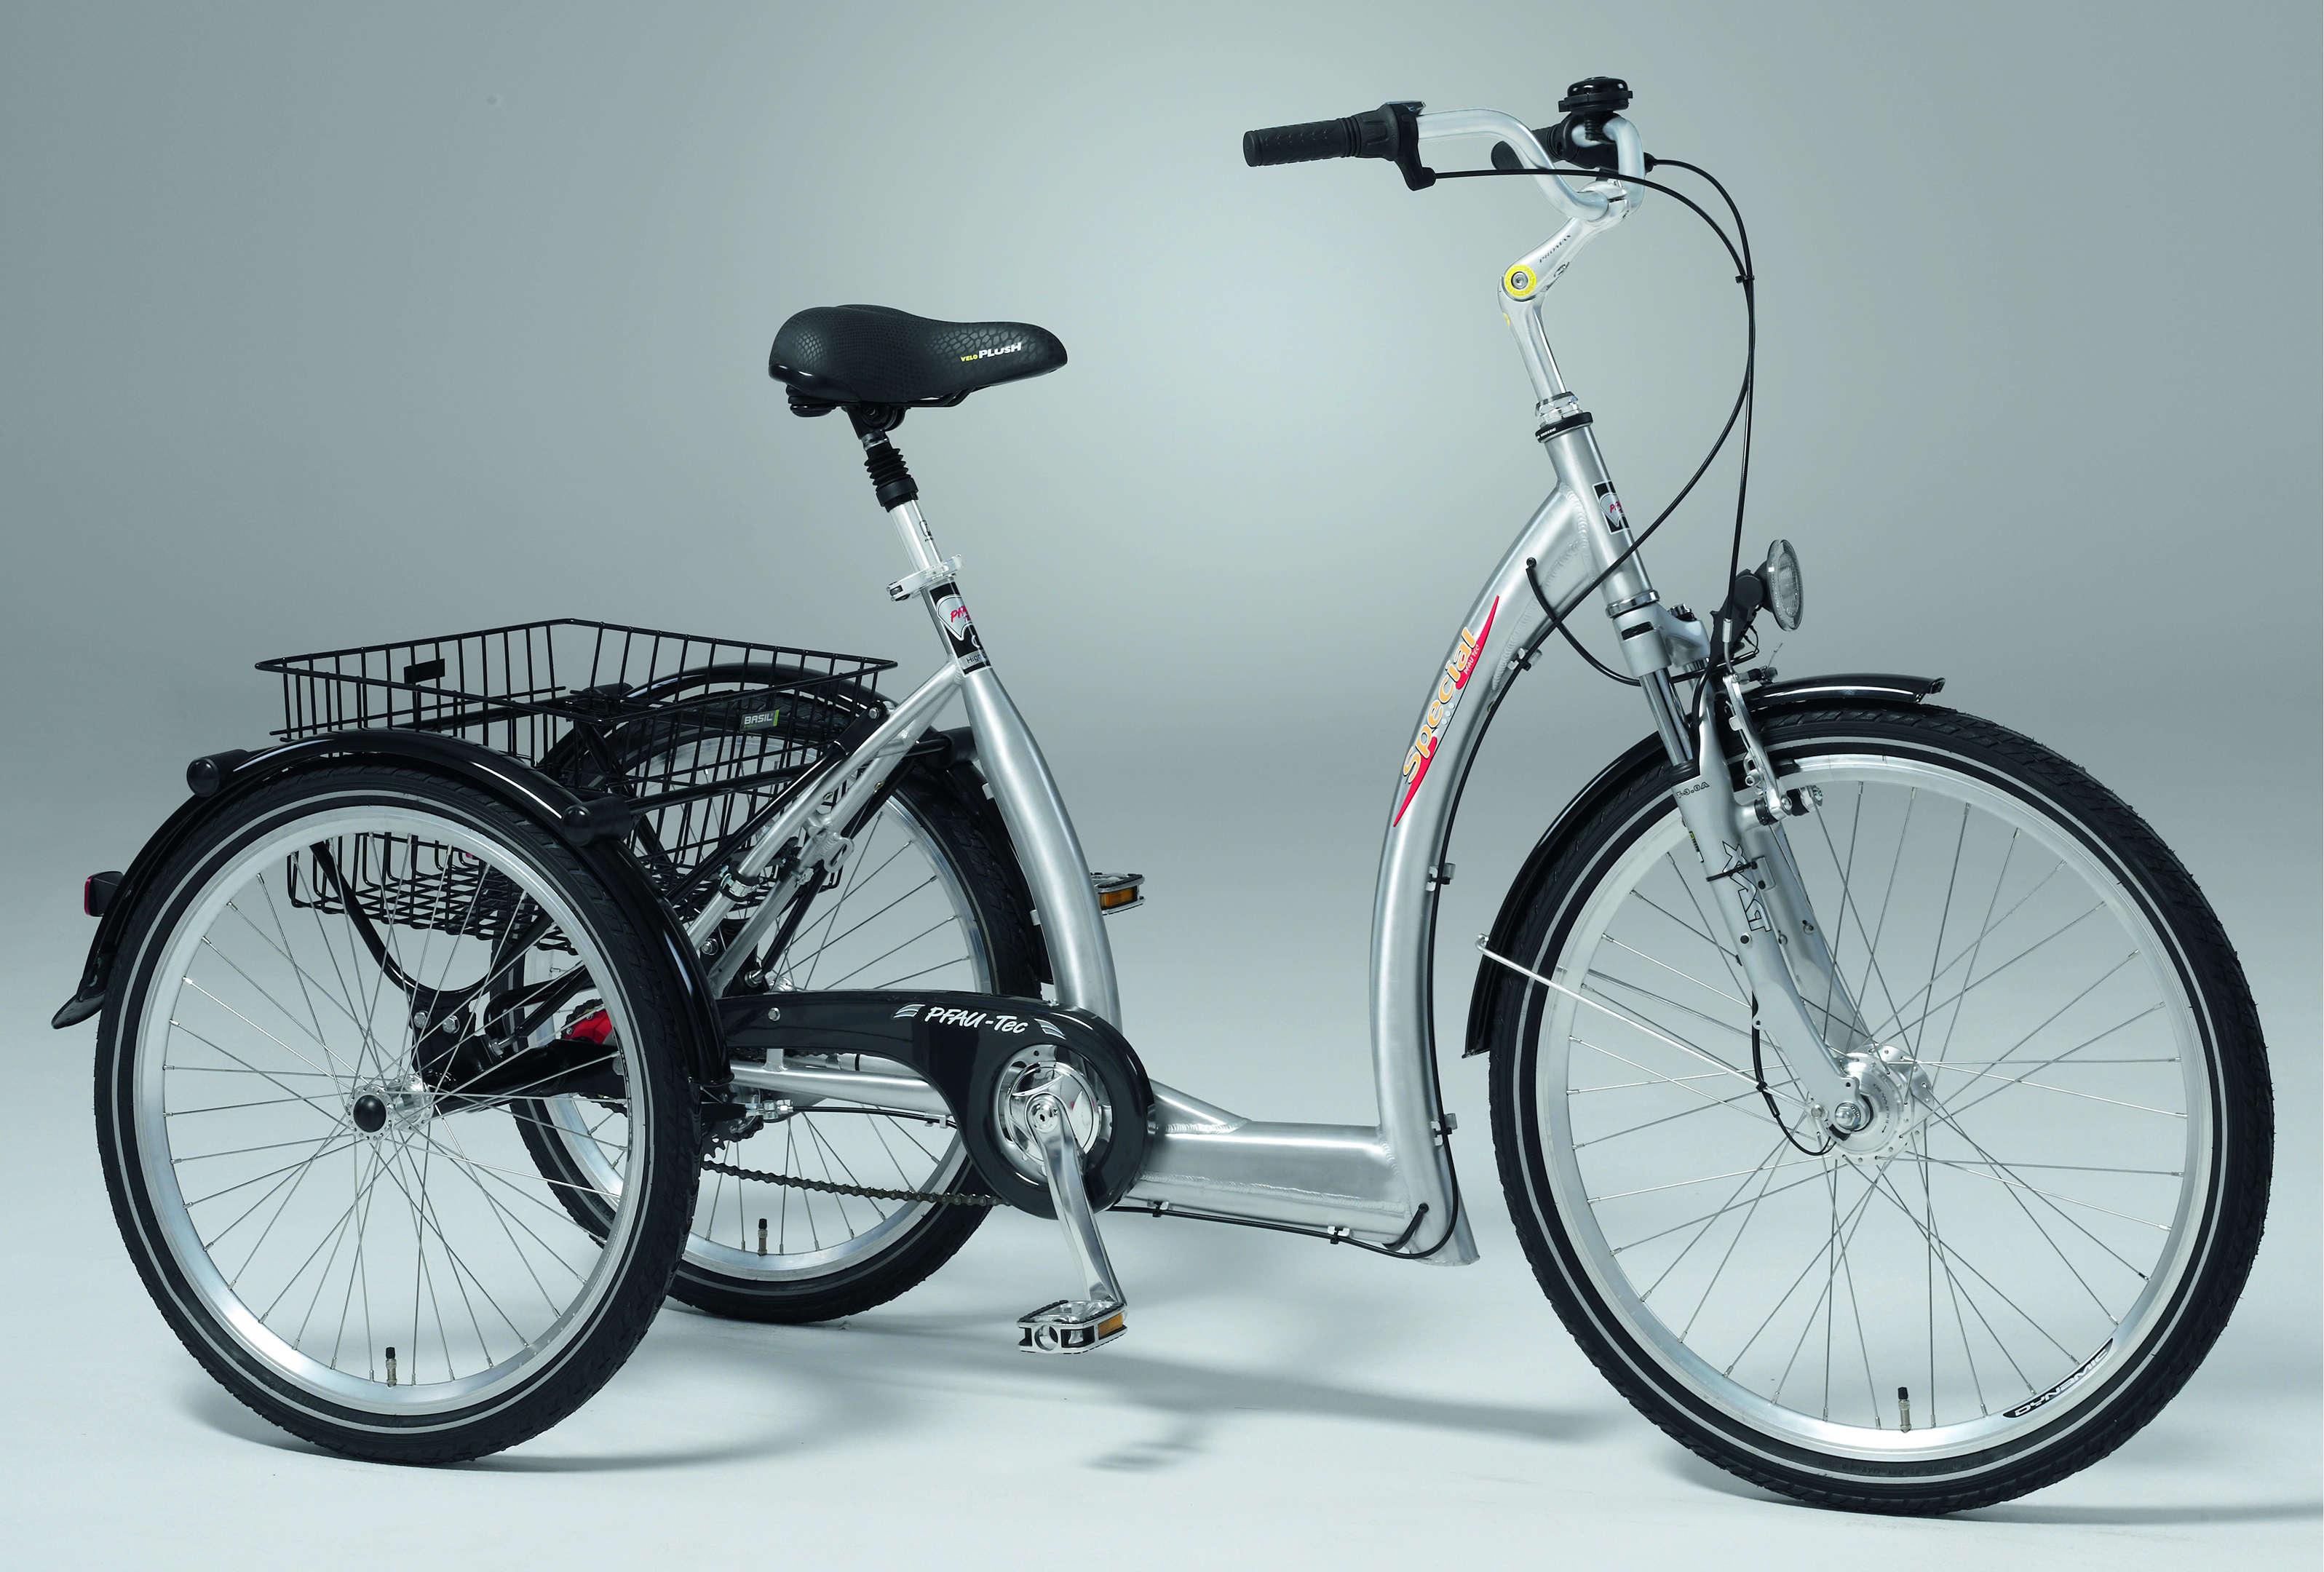 pfau tec dreirad special eurorad bikeleasingeurorad bikeleasing. Black Bedroom Furniture Sets. Home Design Ideas